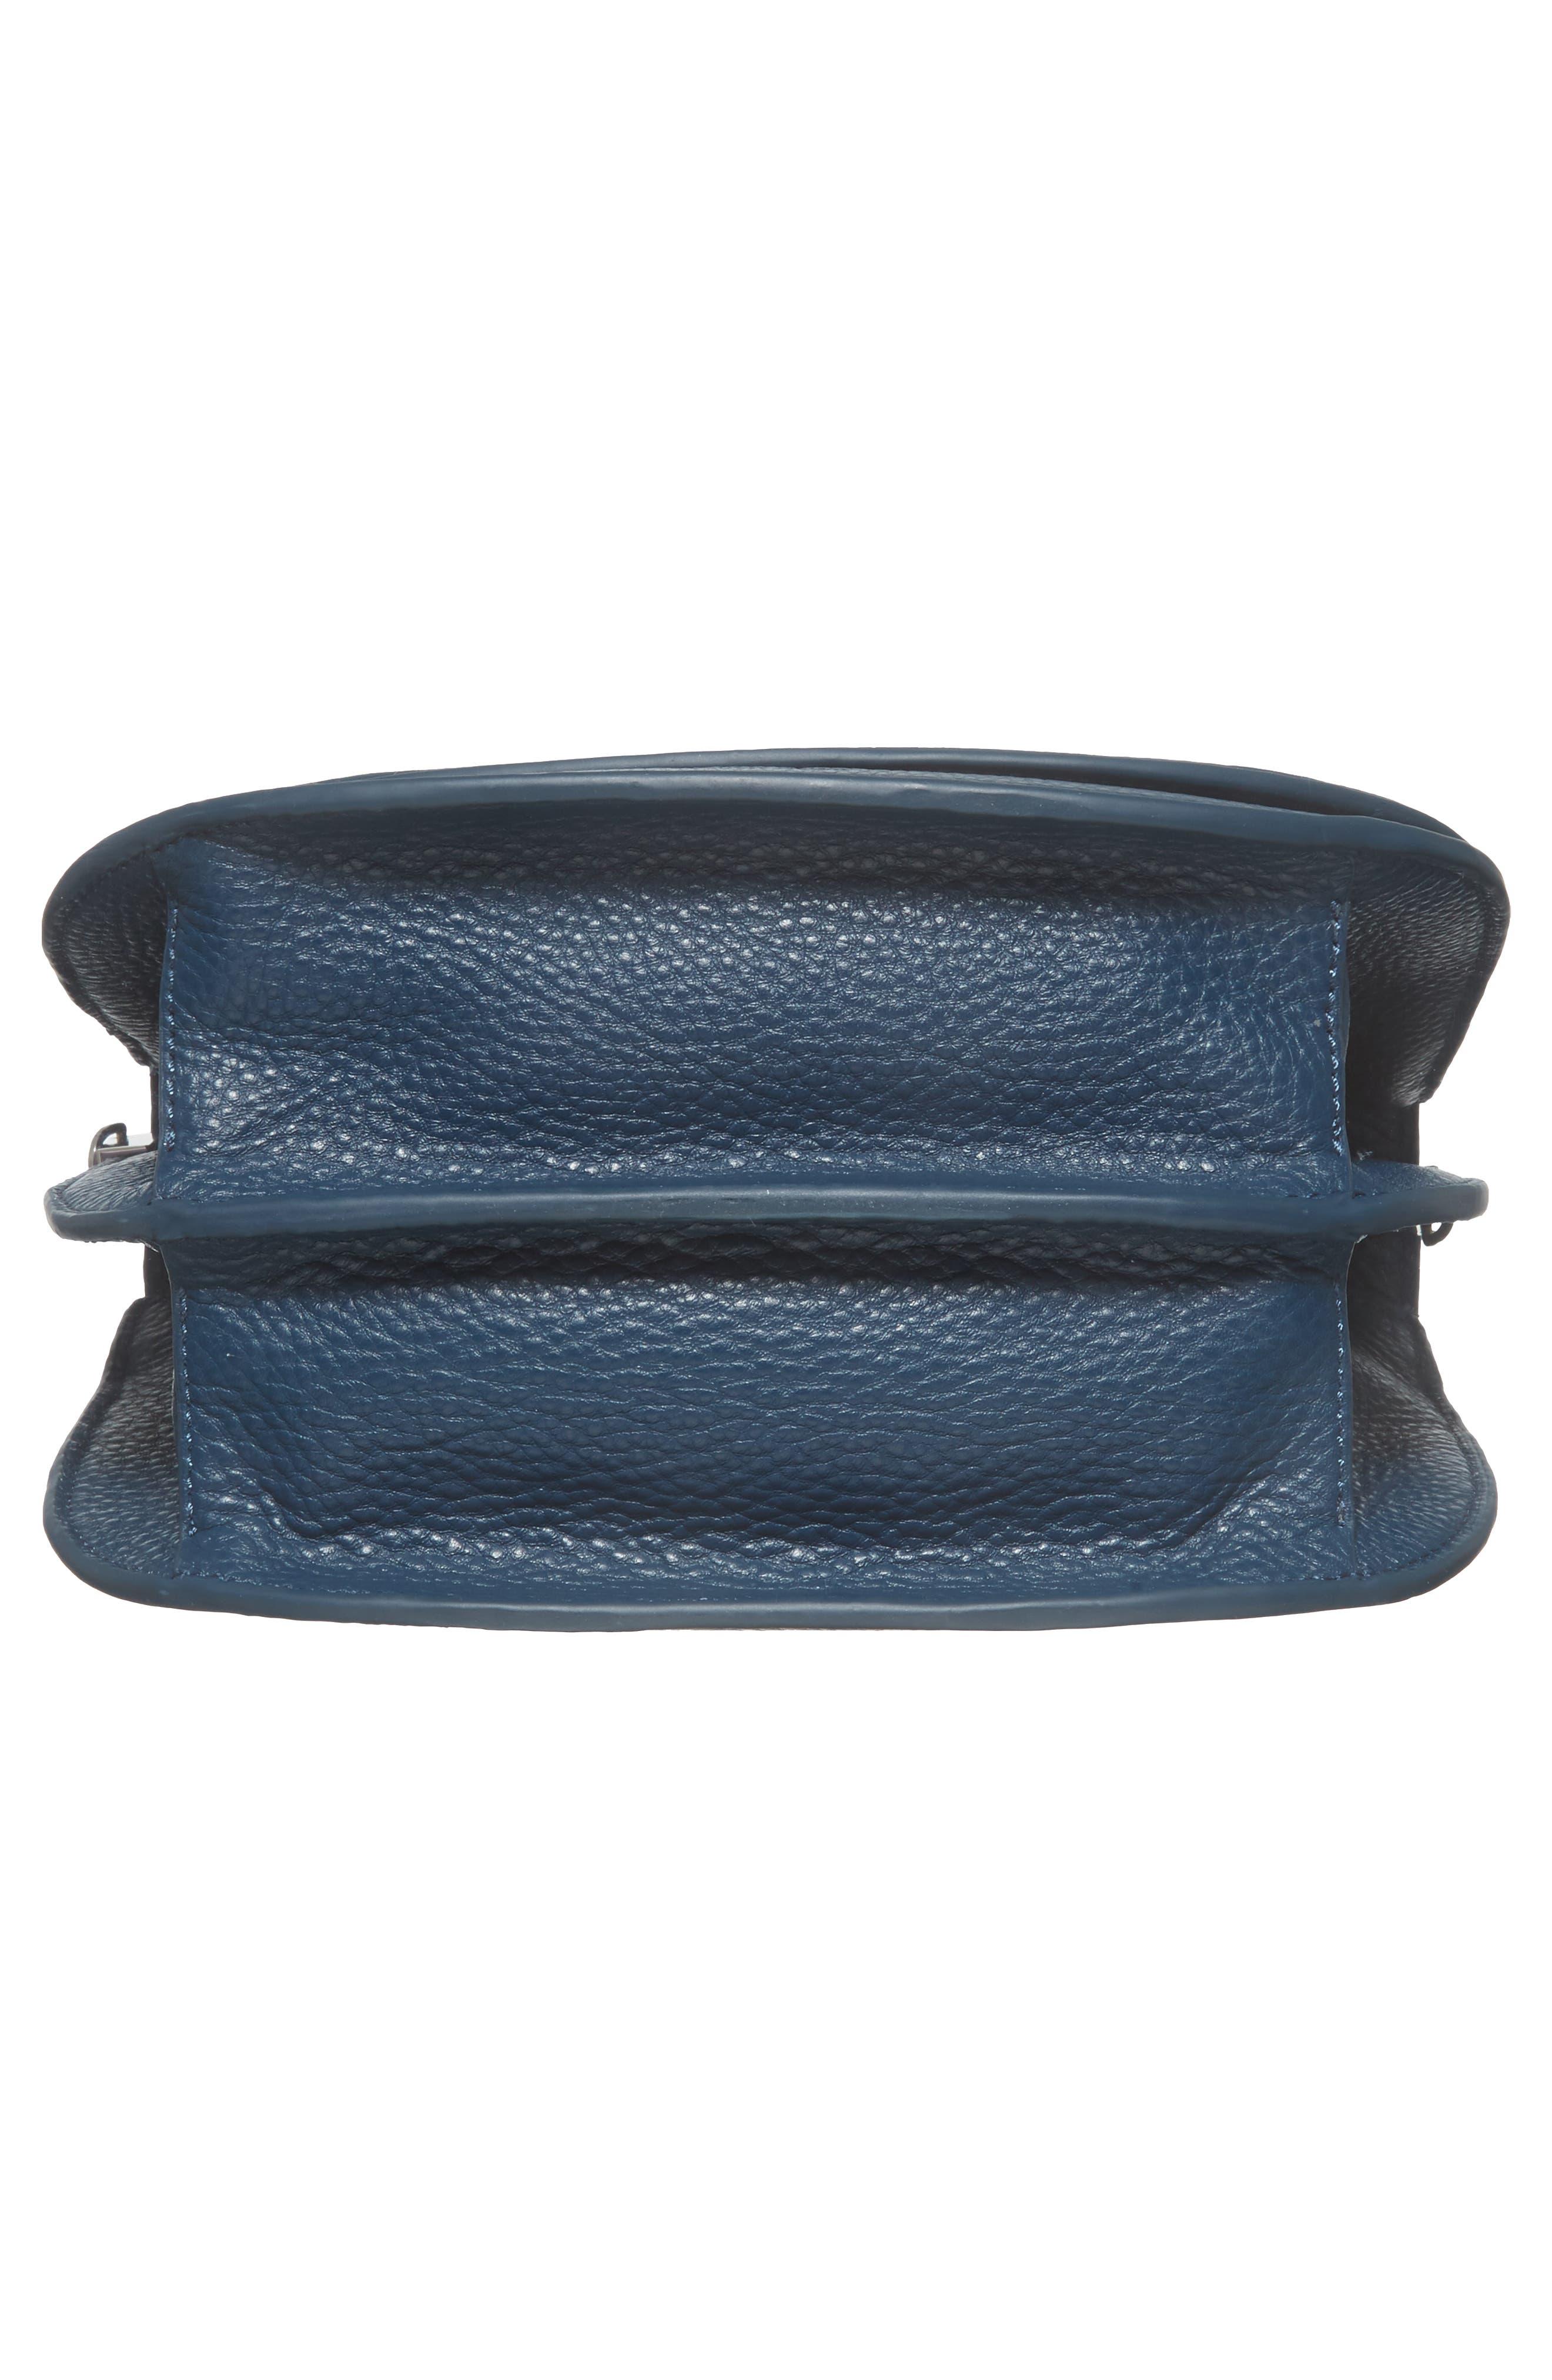 Landon Leather Crossbody Saddle Bag,                             Alternate thumbnail 22, color,